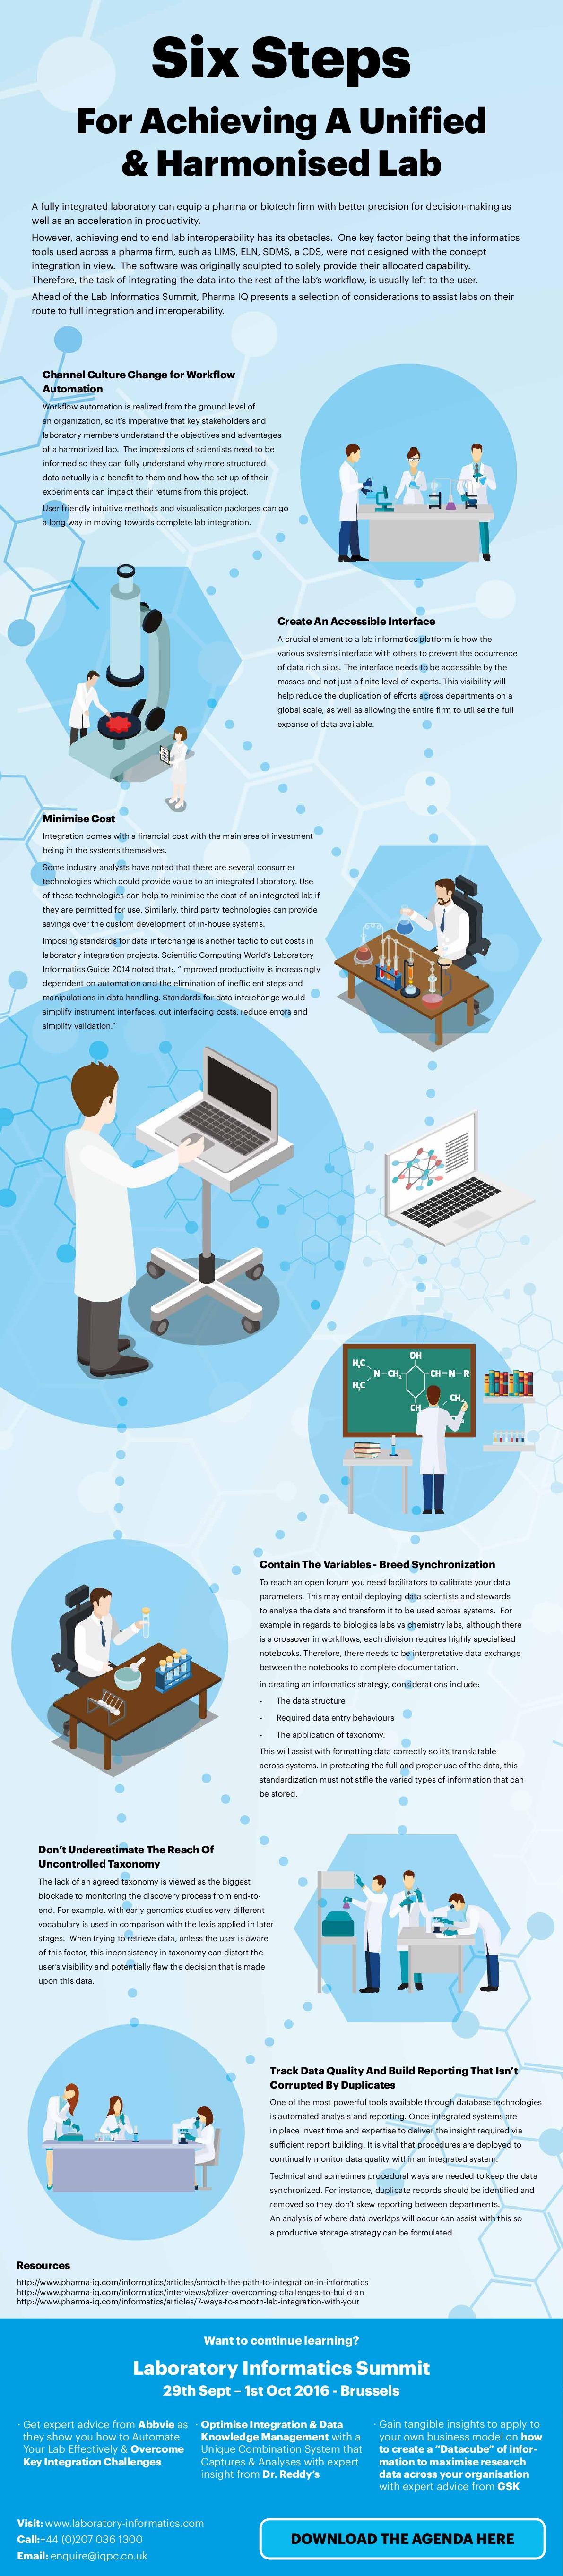 Six Steps To Achieving A Unified & Harmonised Lab   Pharma IQ